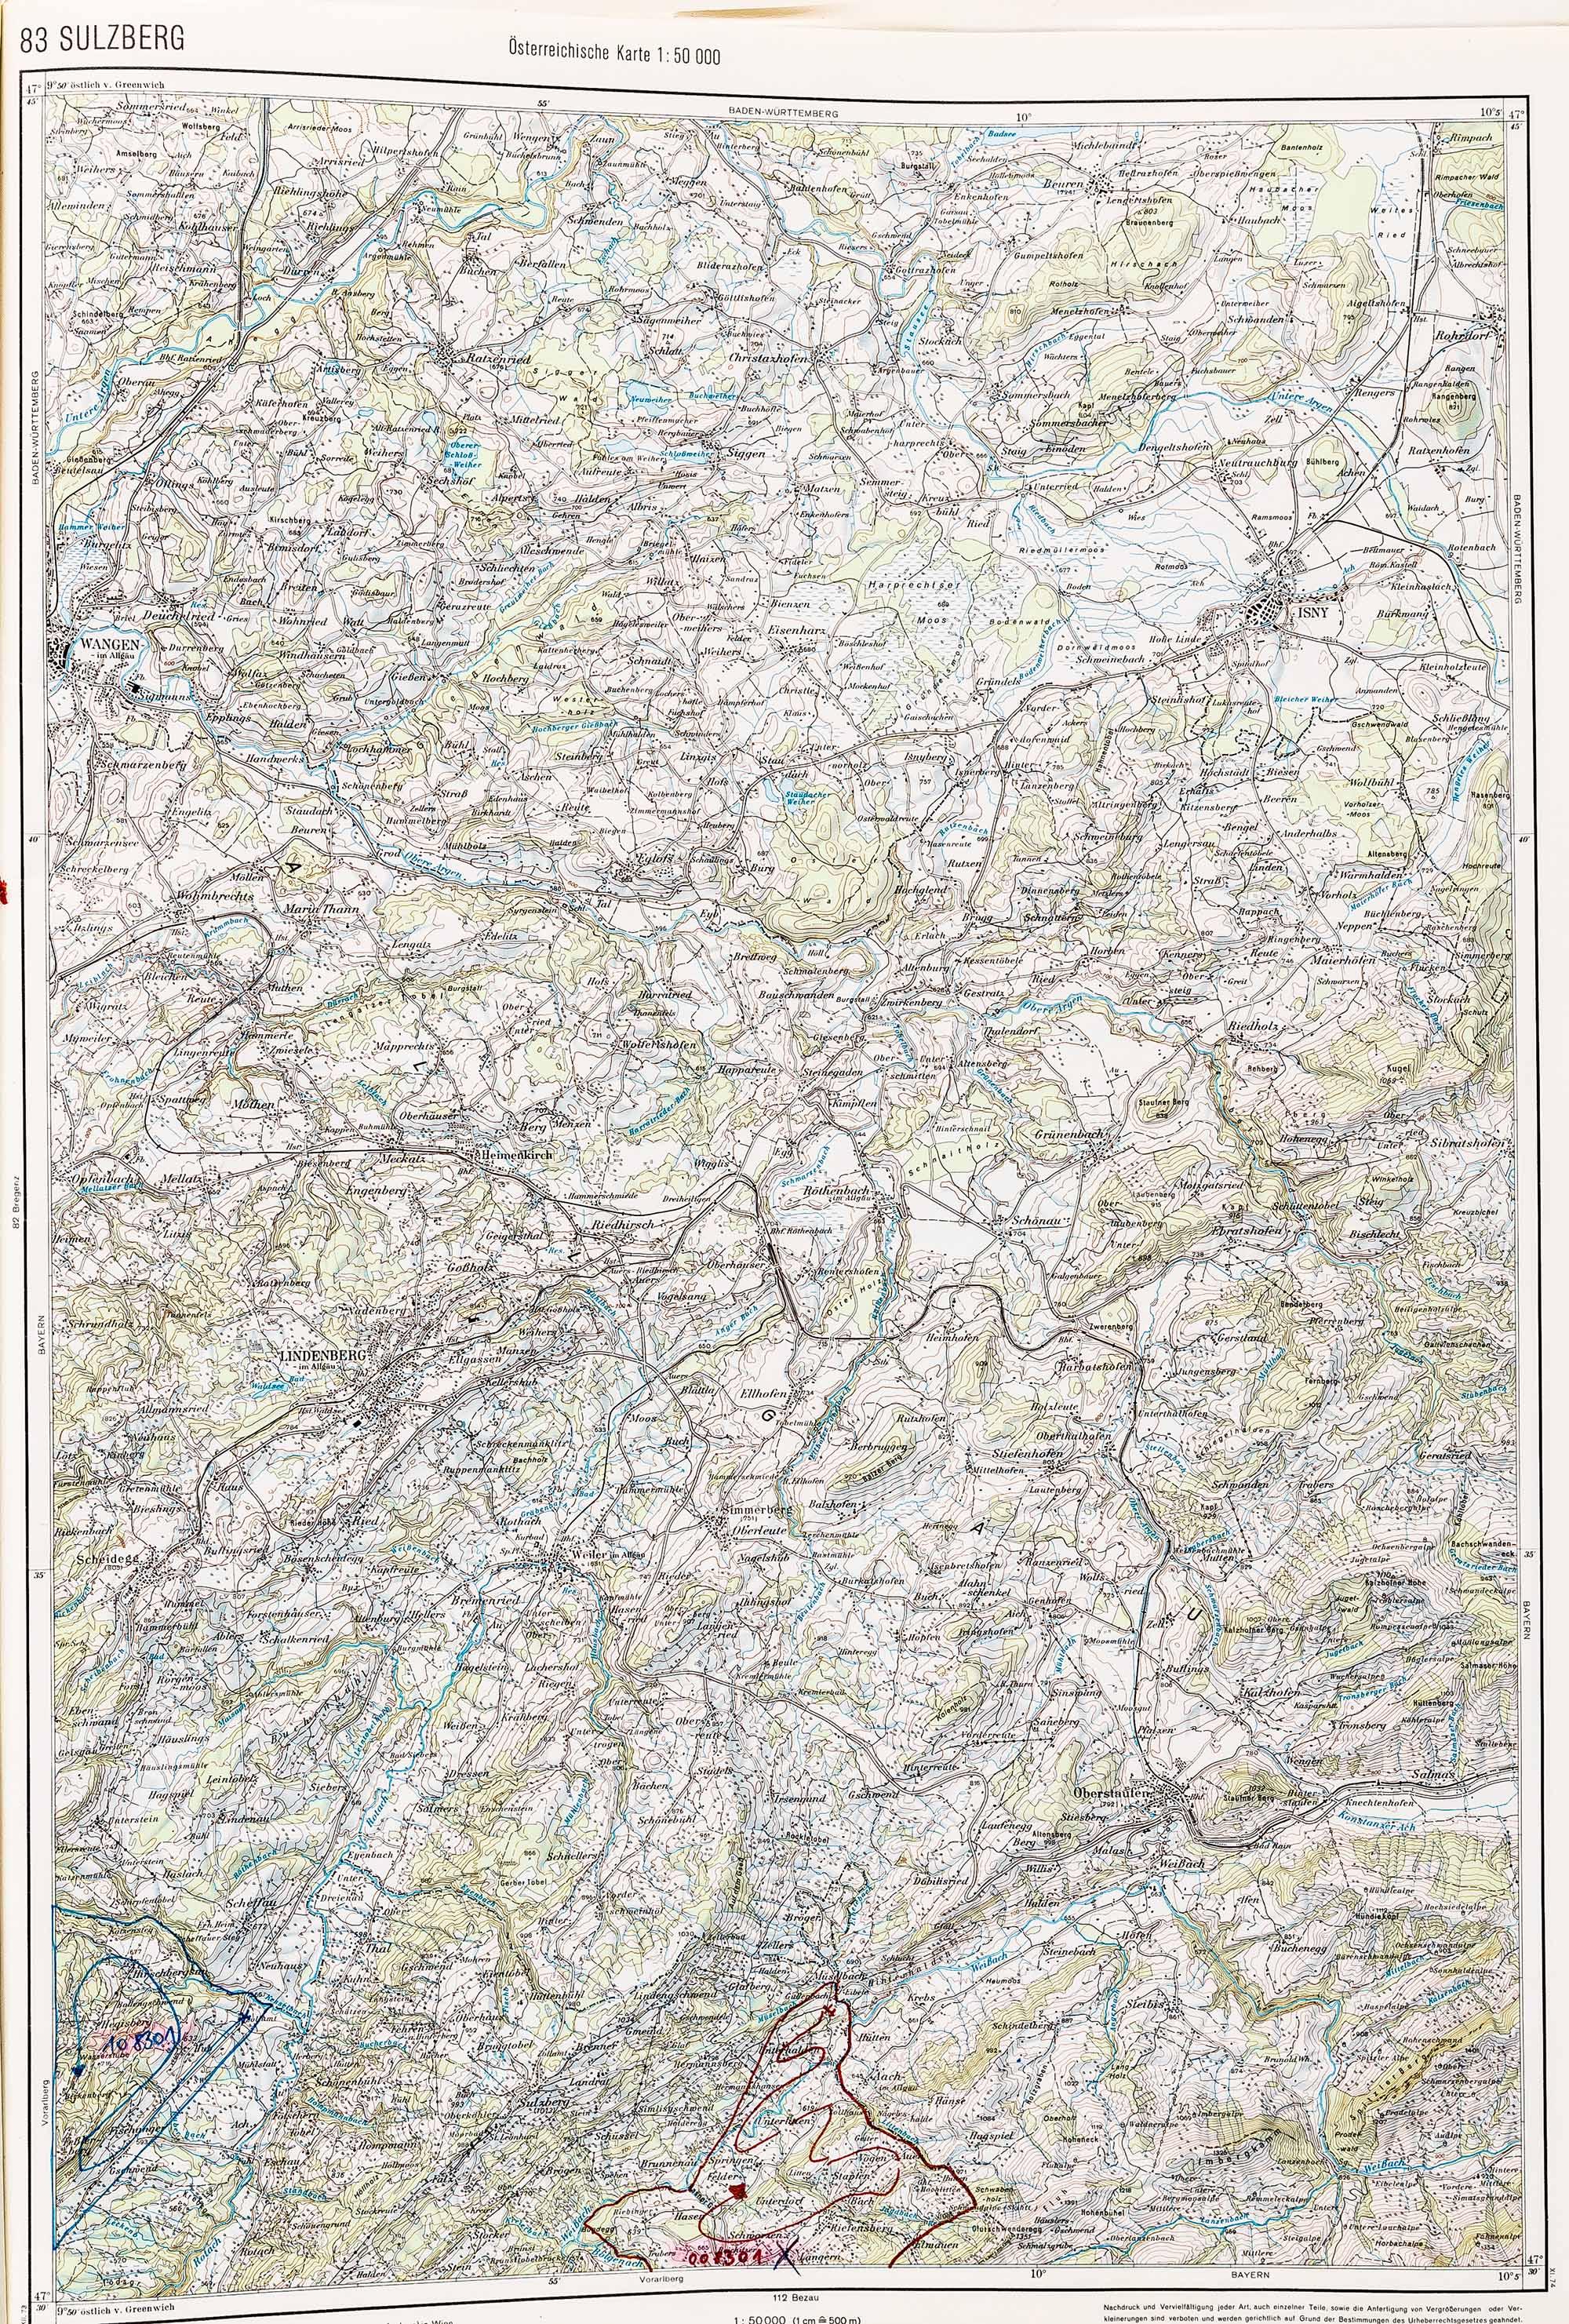 1979-1982 Karte 083